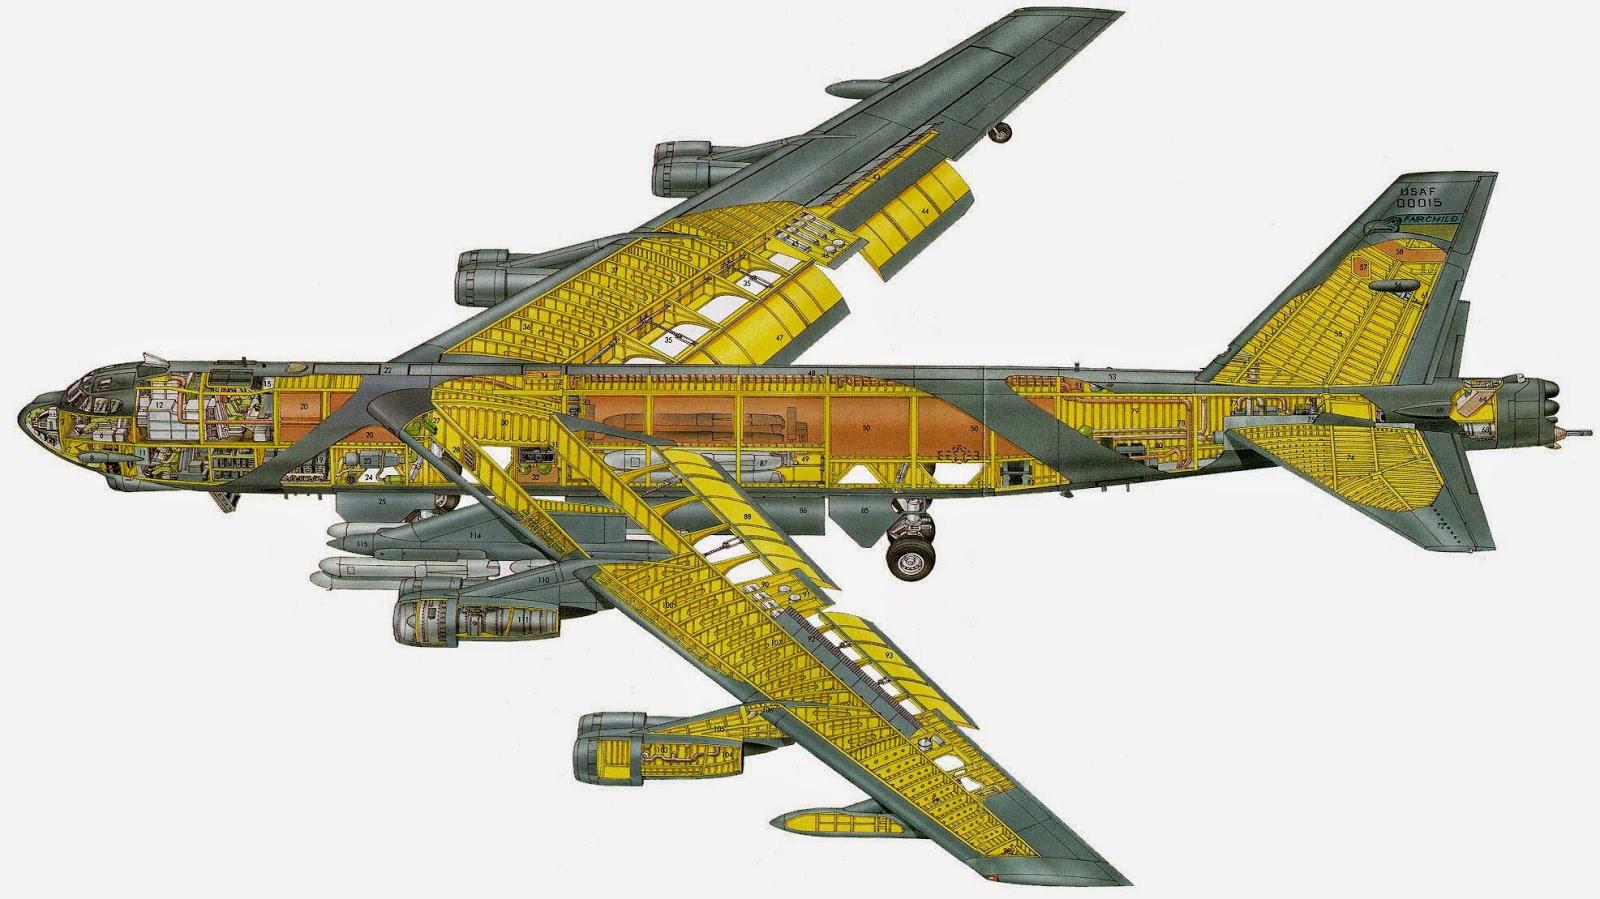 Boeing B-52 Stratofortress cutaway